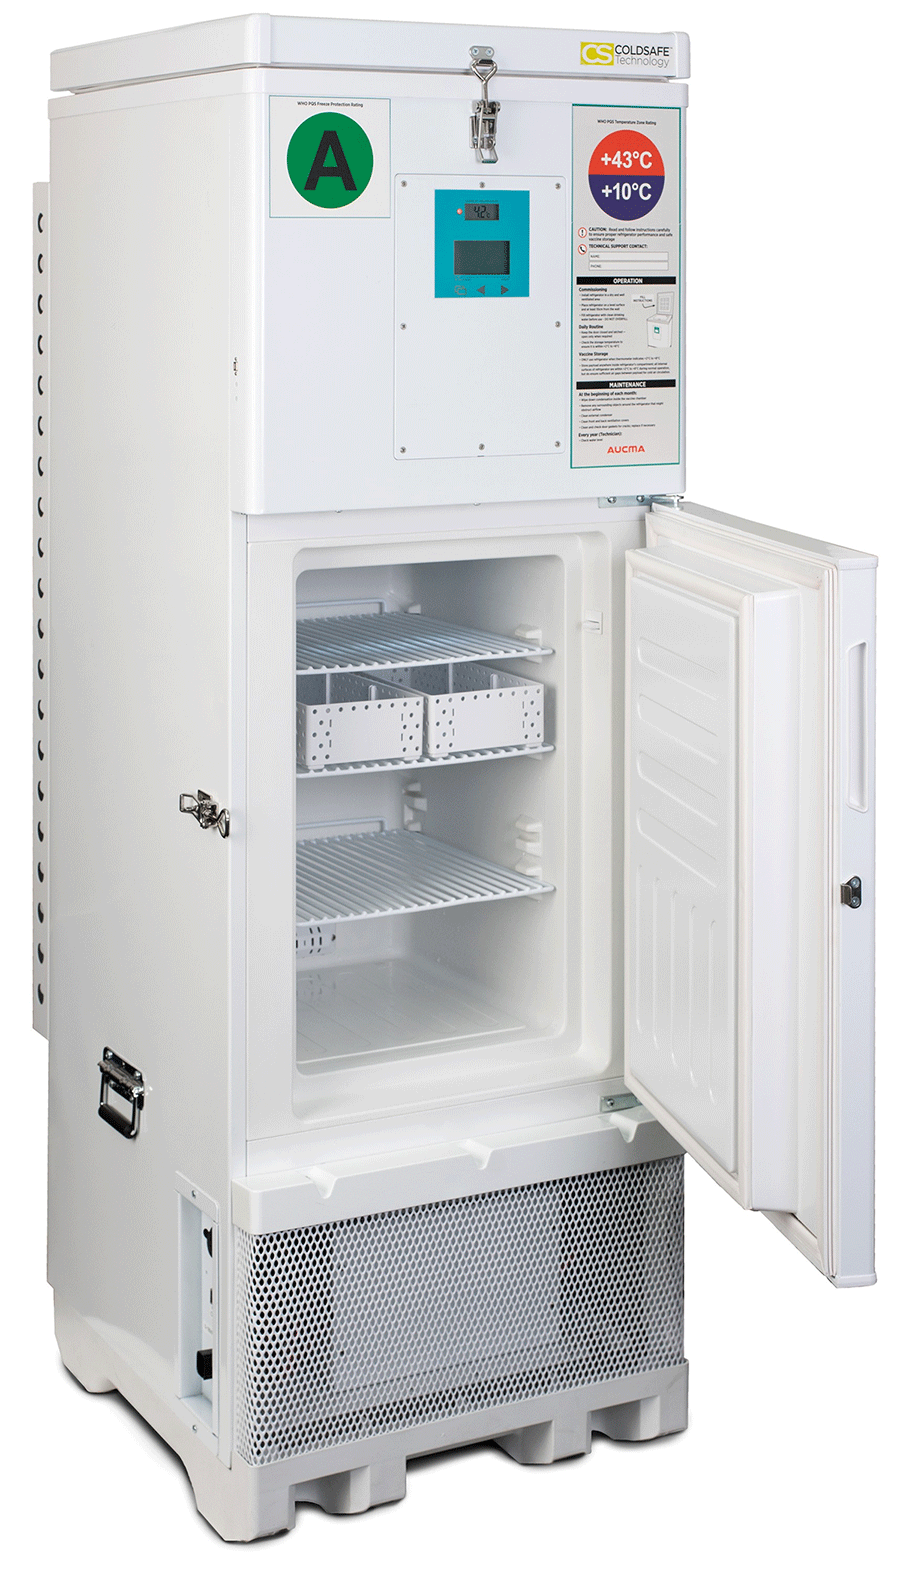 SDD Ref. Aucma MetaFridge CFD50 E003/098